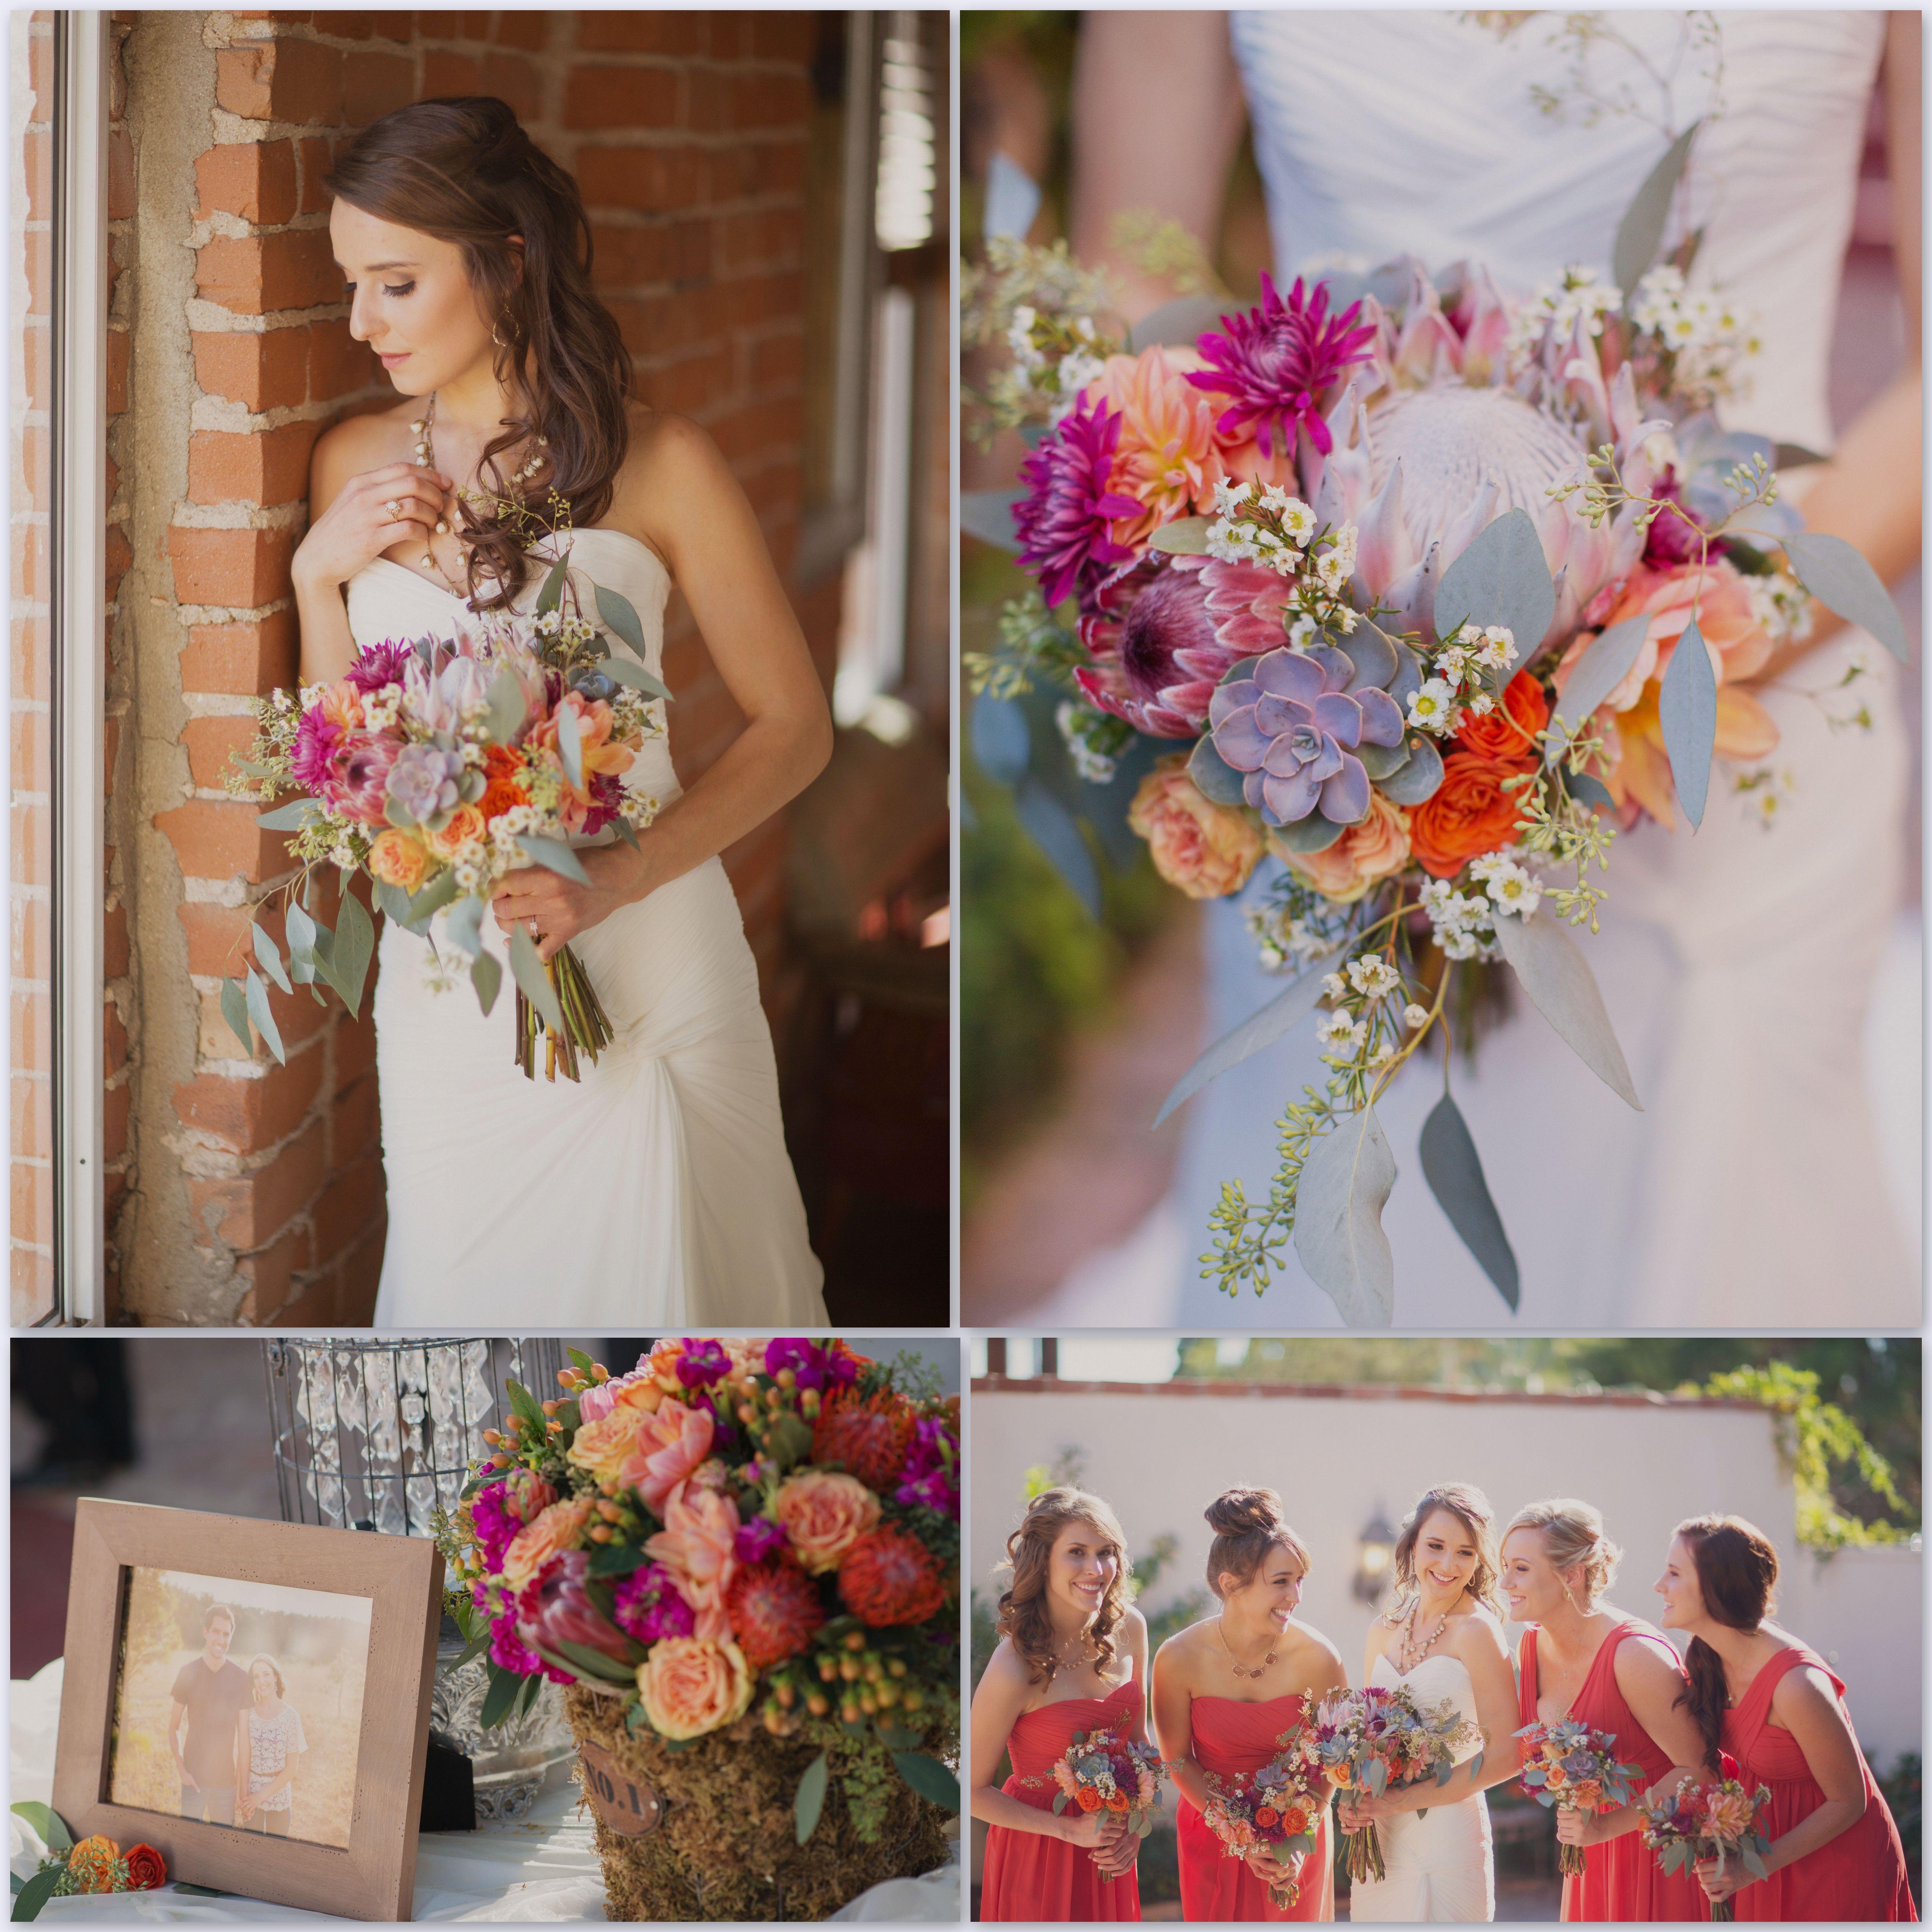 Wedding Gowns Az: Beautiful Wedding At The Stillwell House, Tucson, Arizona